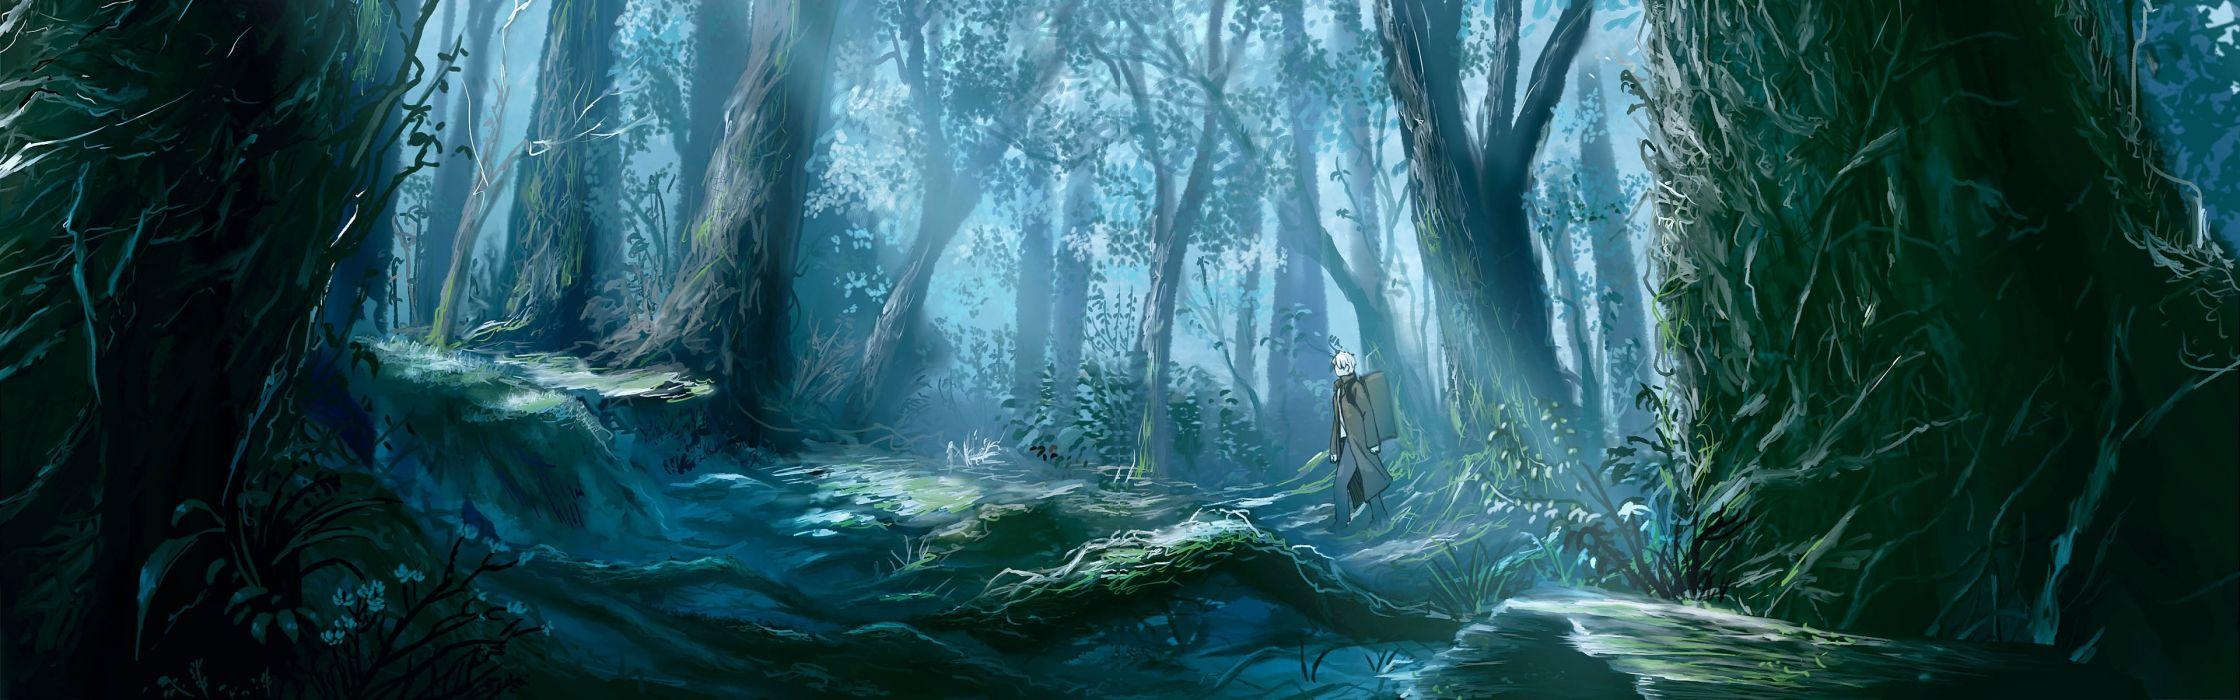 Mushishi Ginko Forest Walking Scenic anime series character original wallpaper